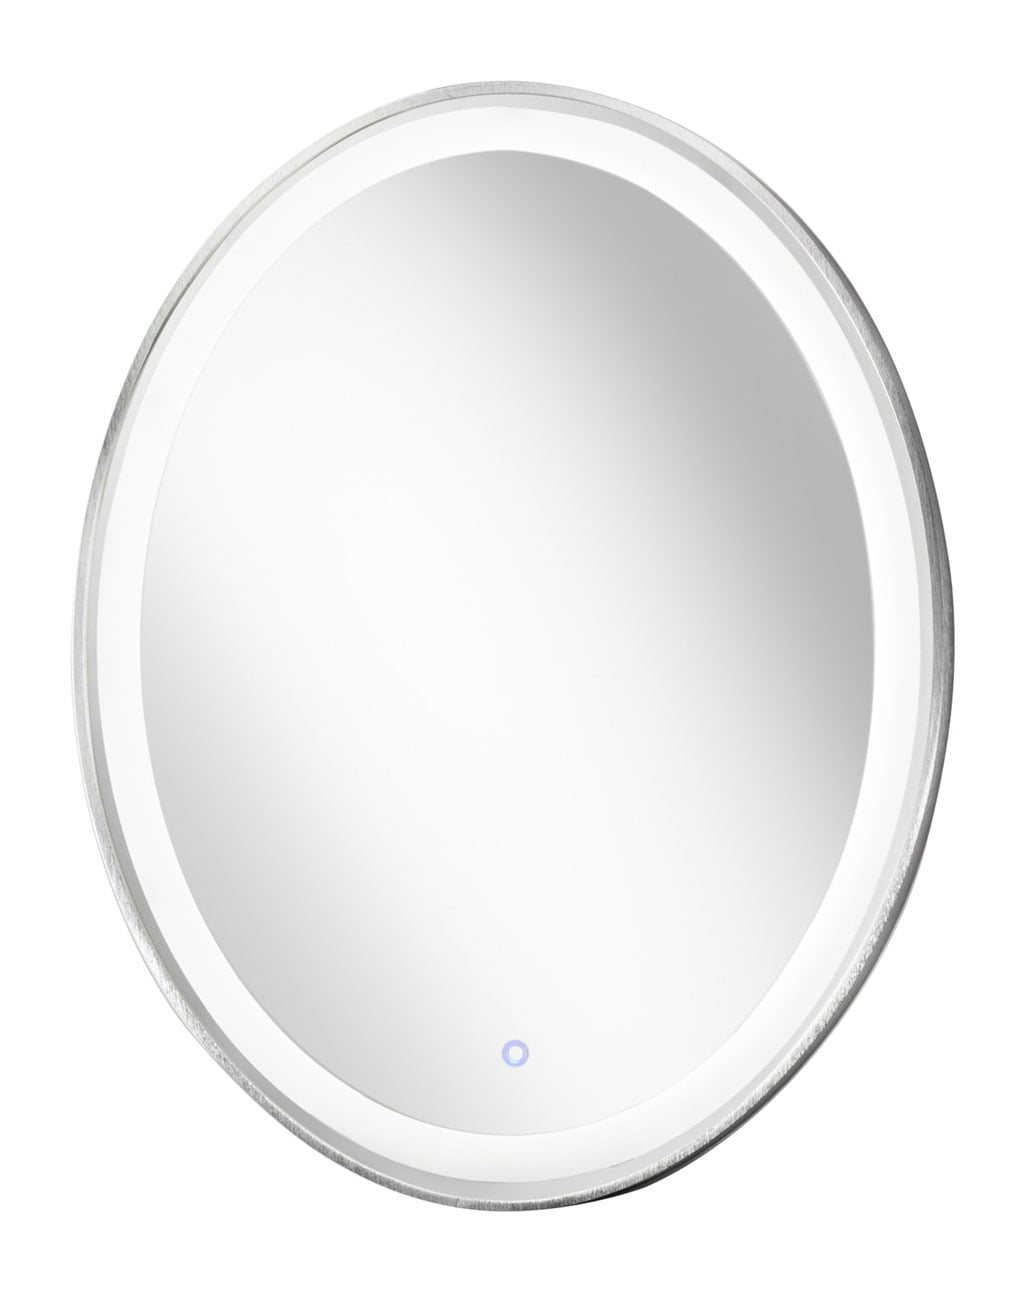 Pool Illuminated Mirror Oval, Silver